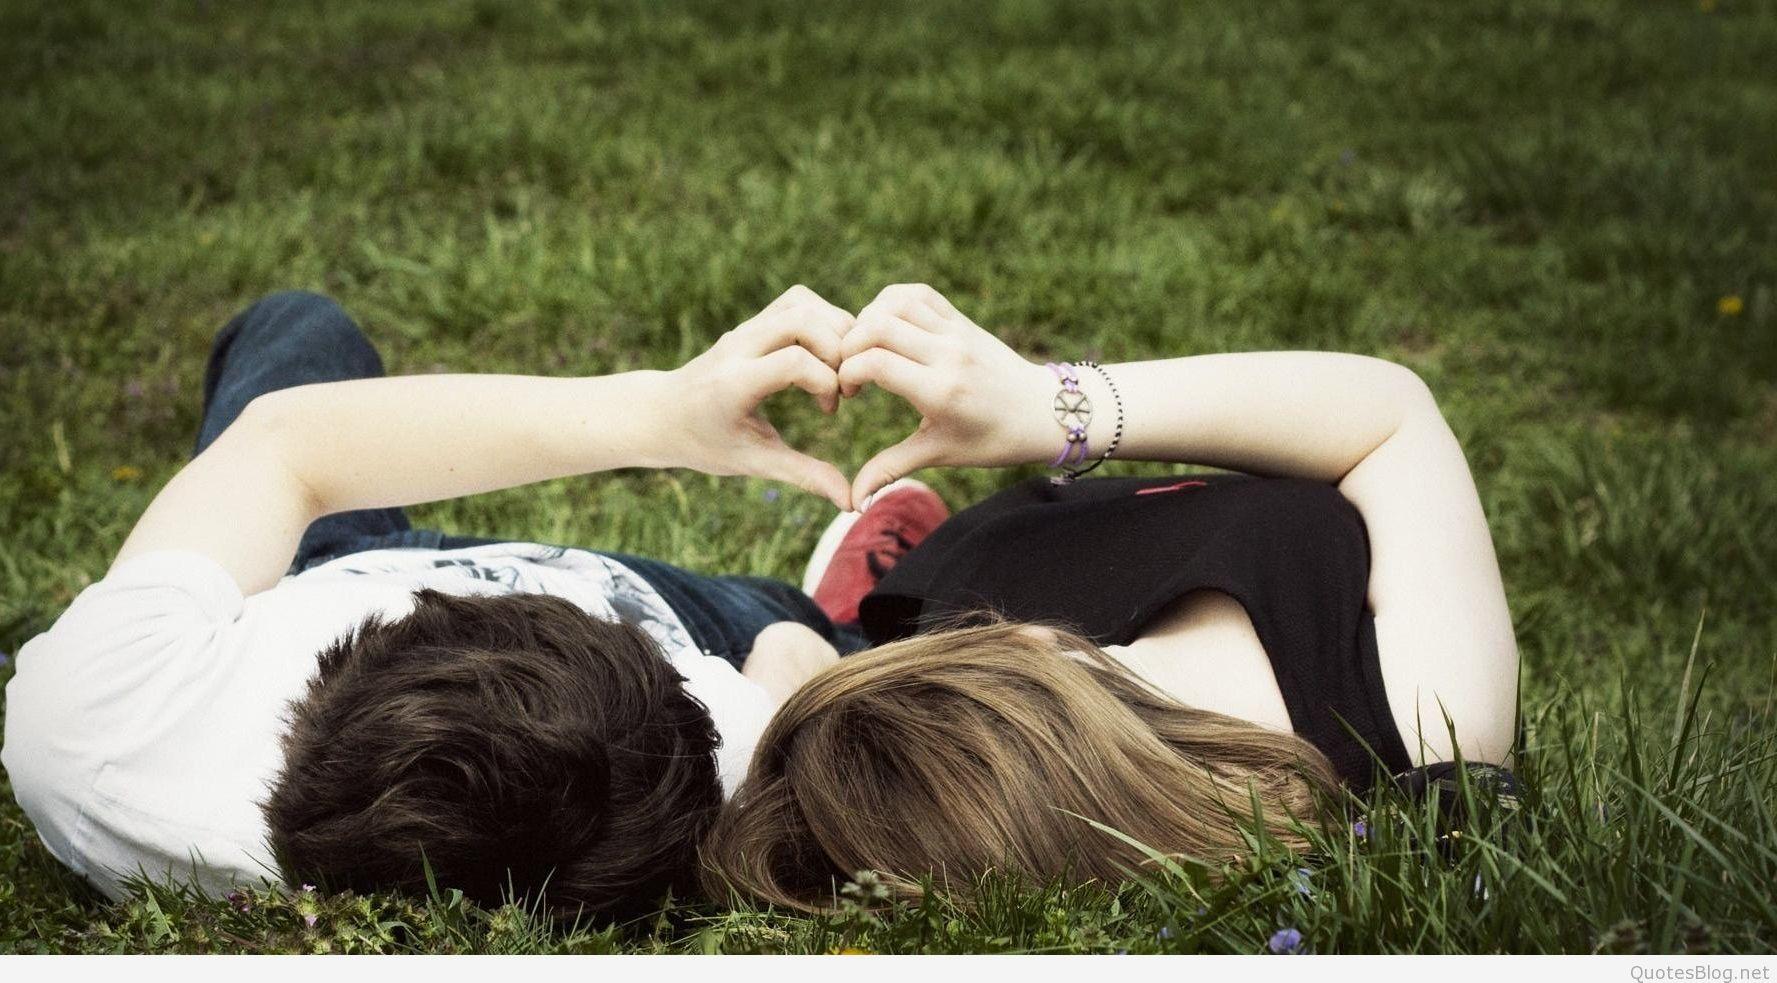 Amazing Love Couples Hd Wallpaper 1080p Widescreen New Wallpaper